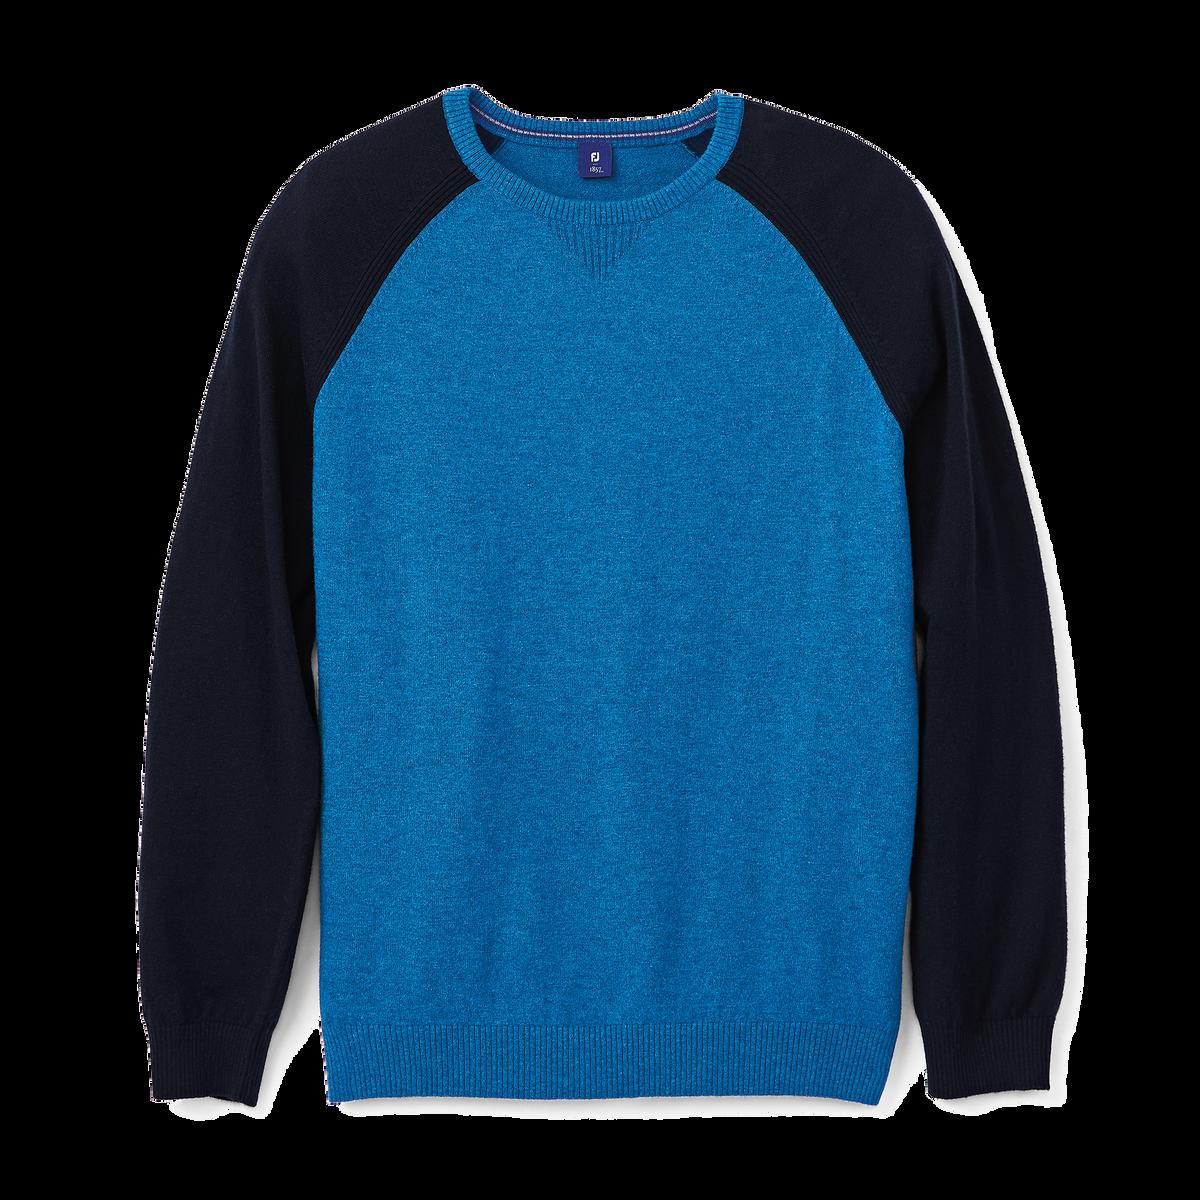 Raglan Block Sweater